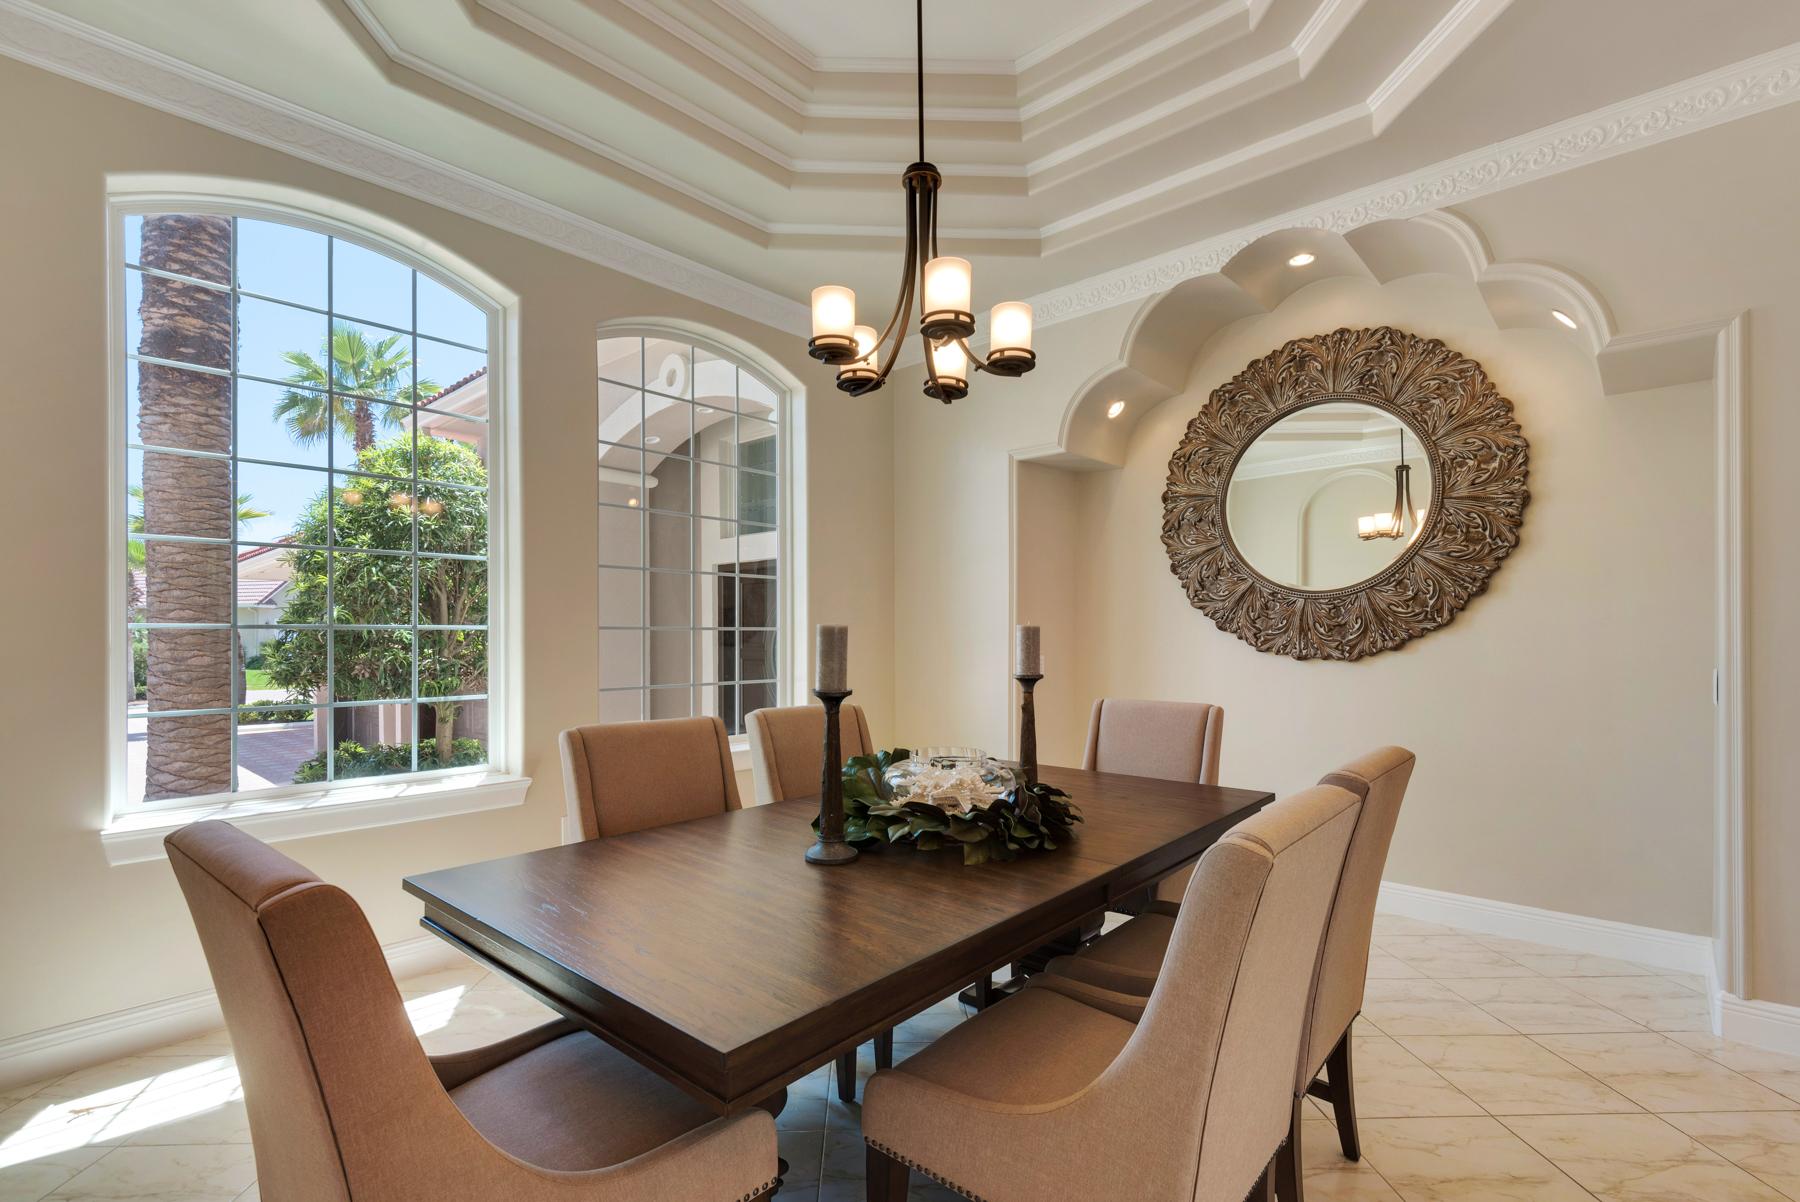 Bella casa a destin getaways rental property for Formal dining area